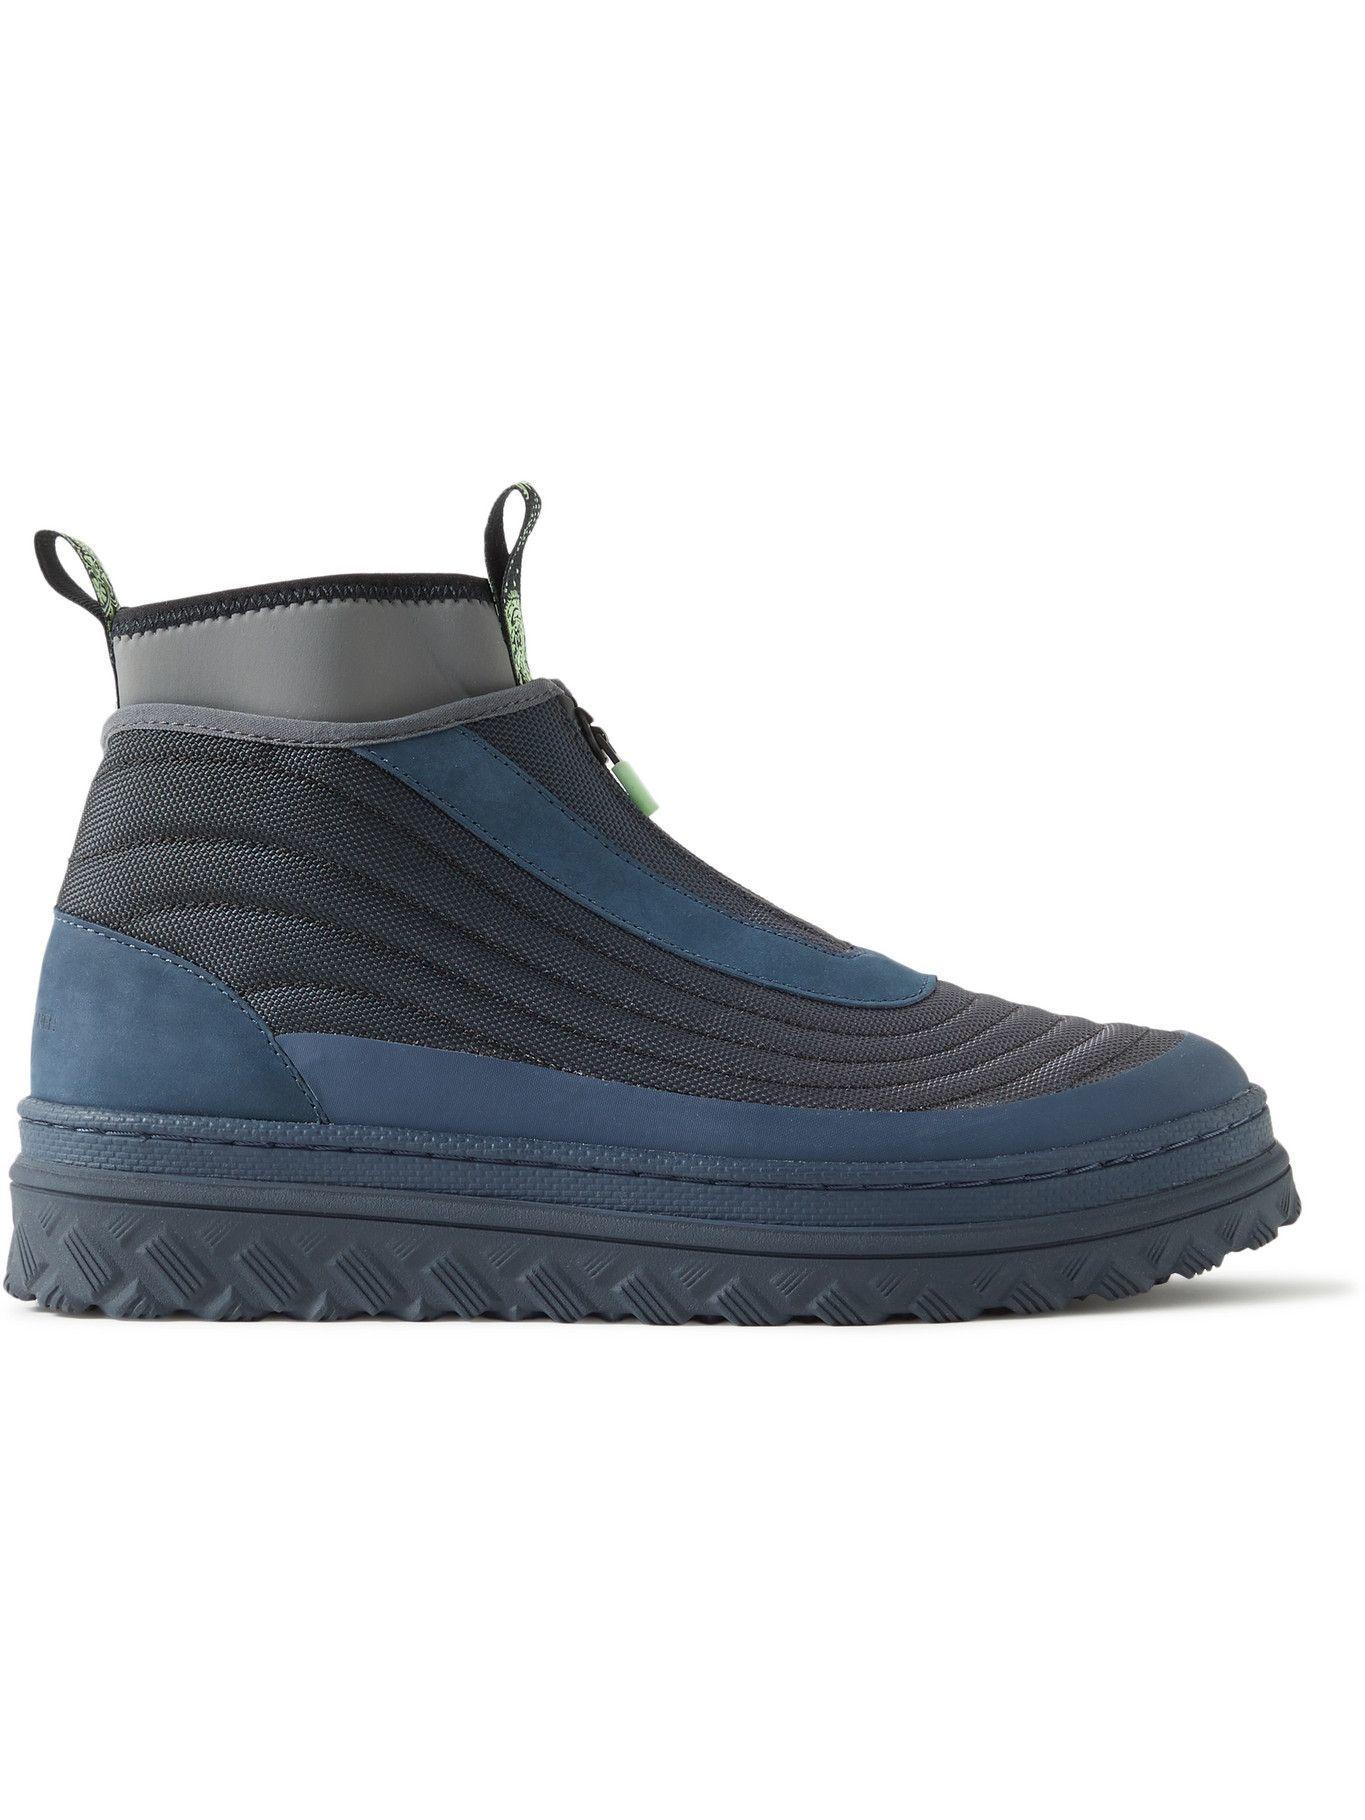 Photo: Converse - paria /FARZANEH Pro Leather X2 Trek Hi Nubuck and Neoprene-Trimmed Mesh Sneakers - Black